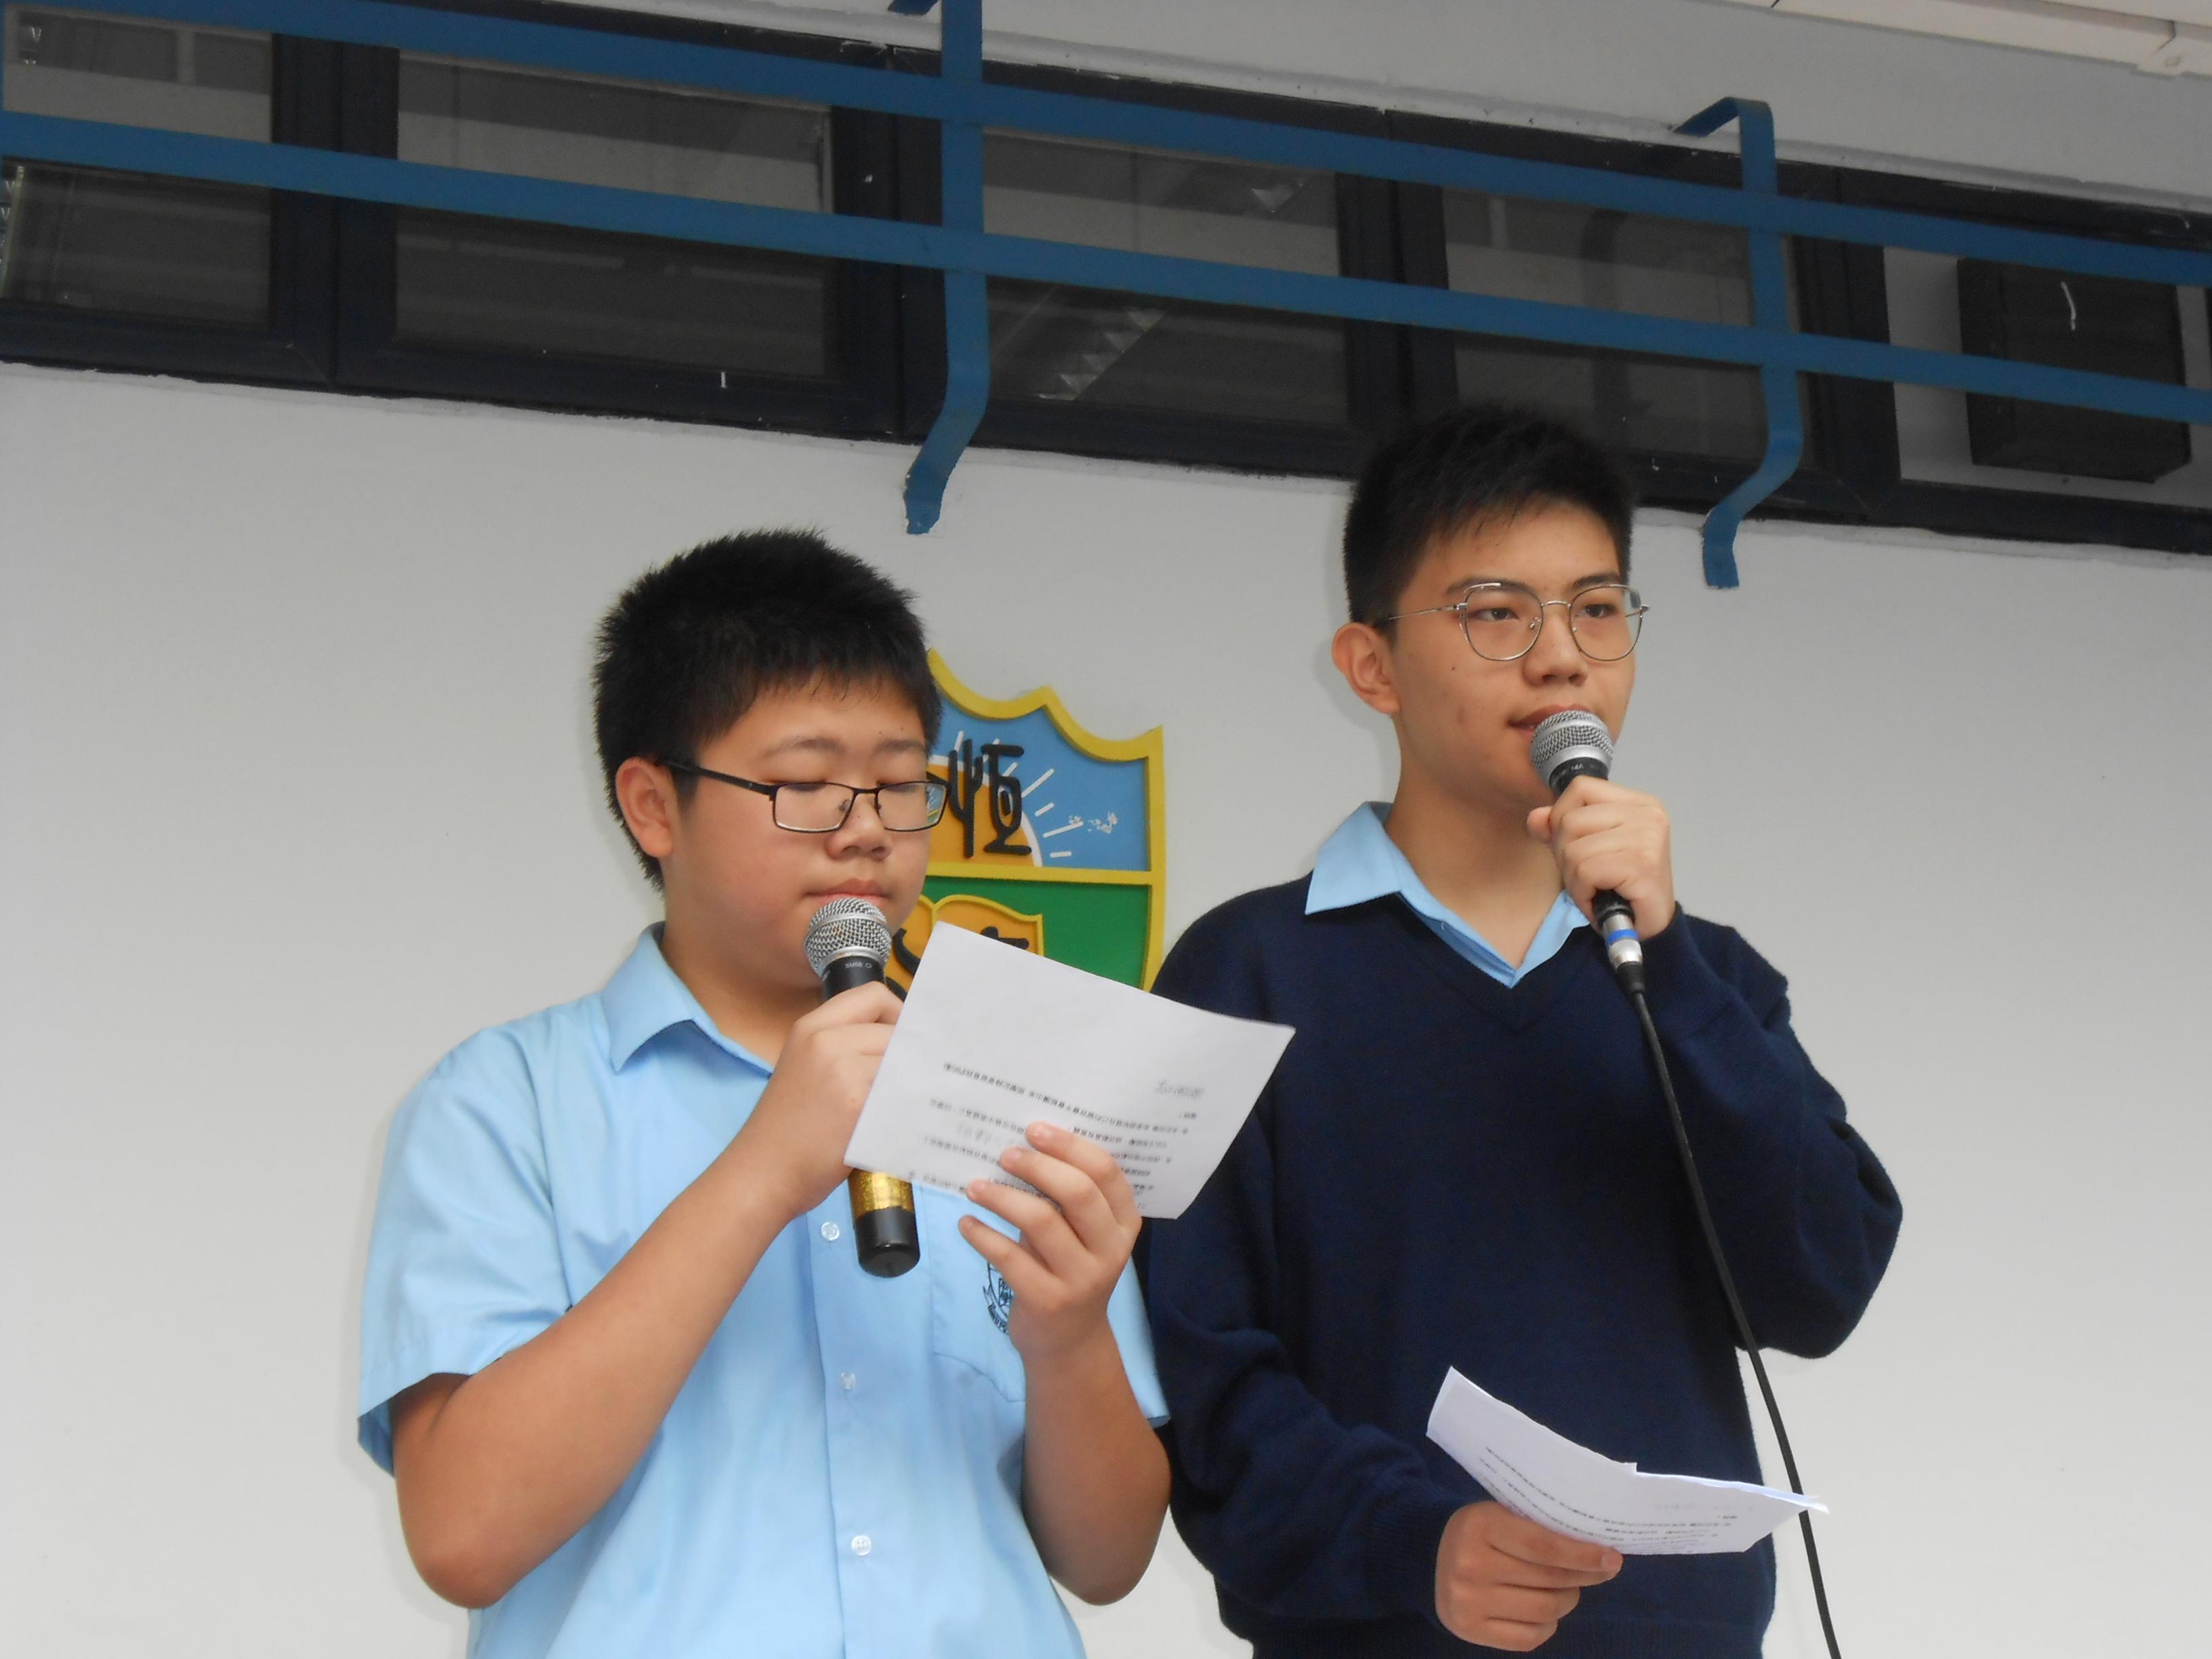 http://npc.edu.hk/sites/default/files/dscn9700.jpg